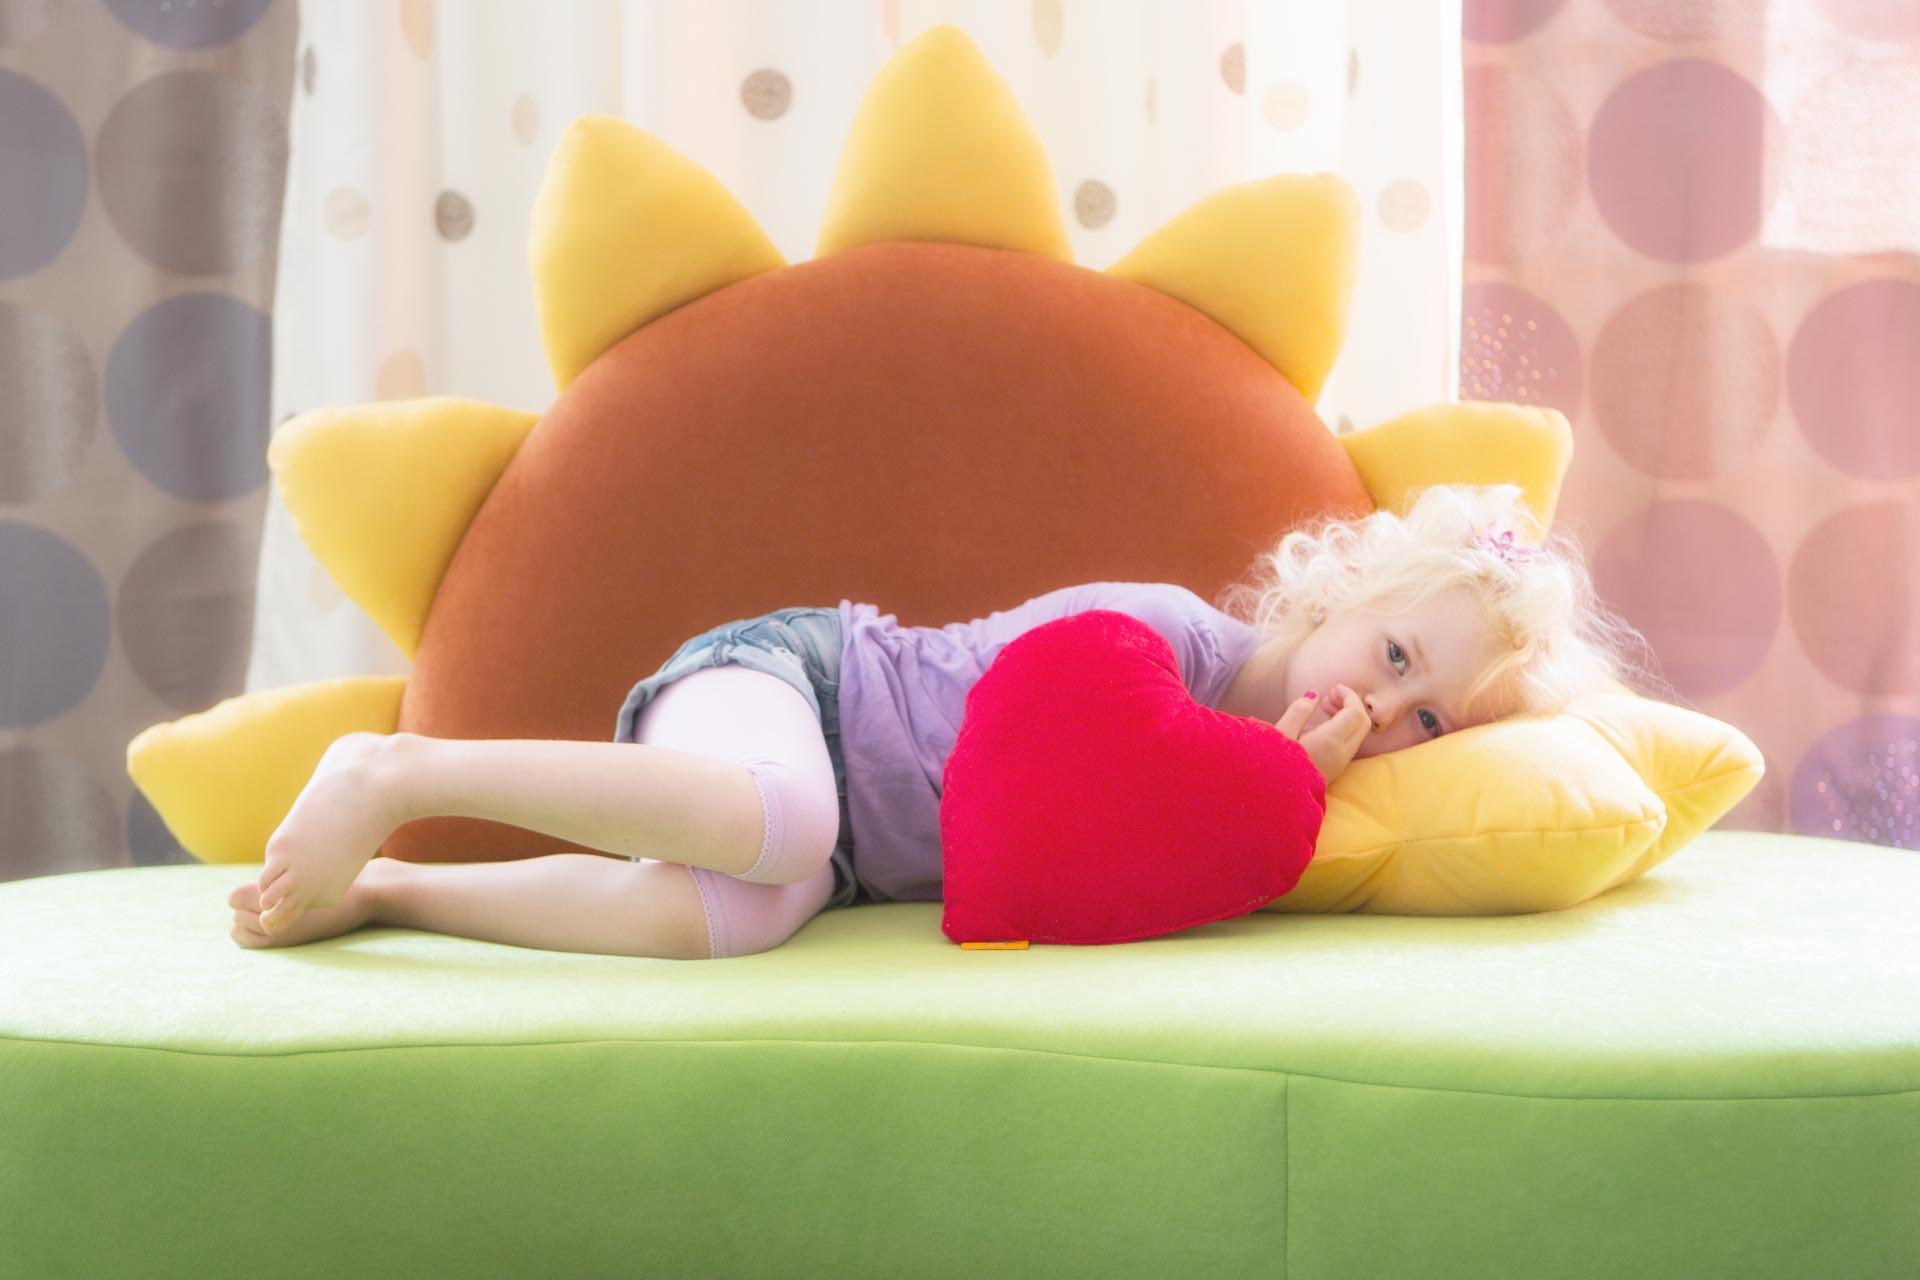 kindersofa mit sonnenblume kinic kindersofas. Black Bedroom Furniture Sets. Home Design Ideas